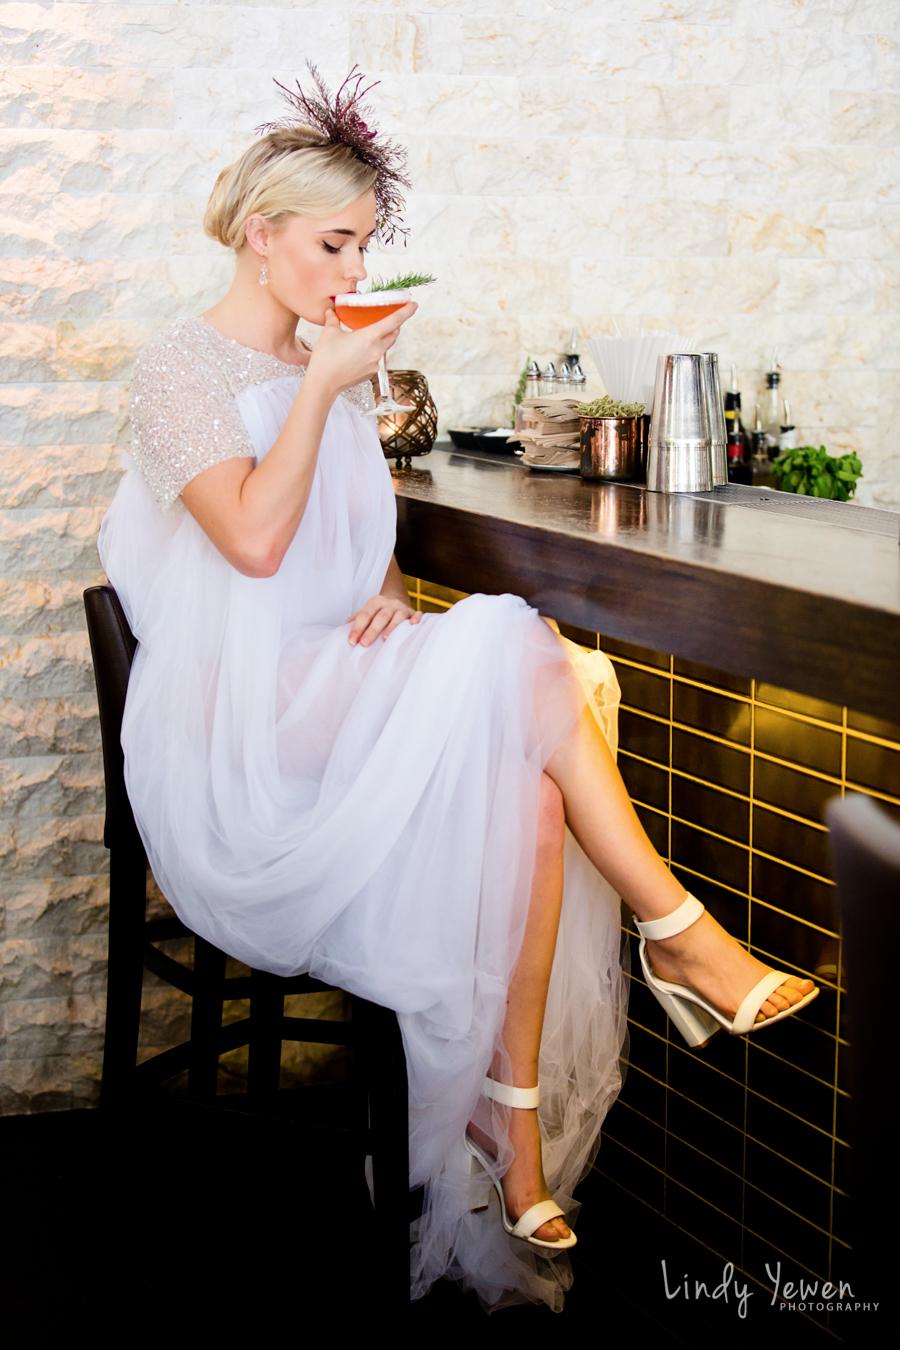 Miss-Moneypennys- Noosa-Photographer-Lindy-Yewen 170-2.jpg